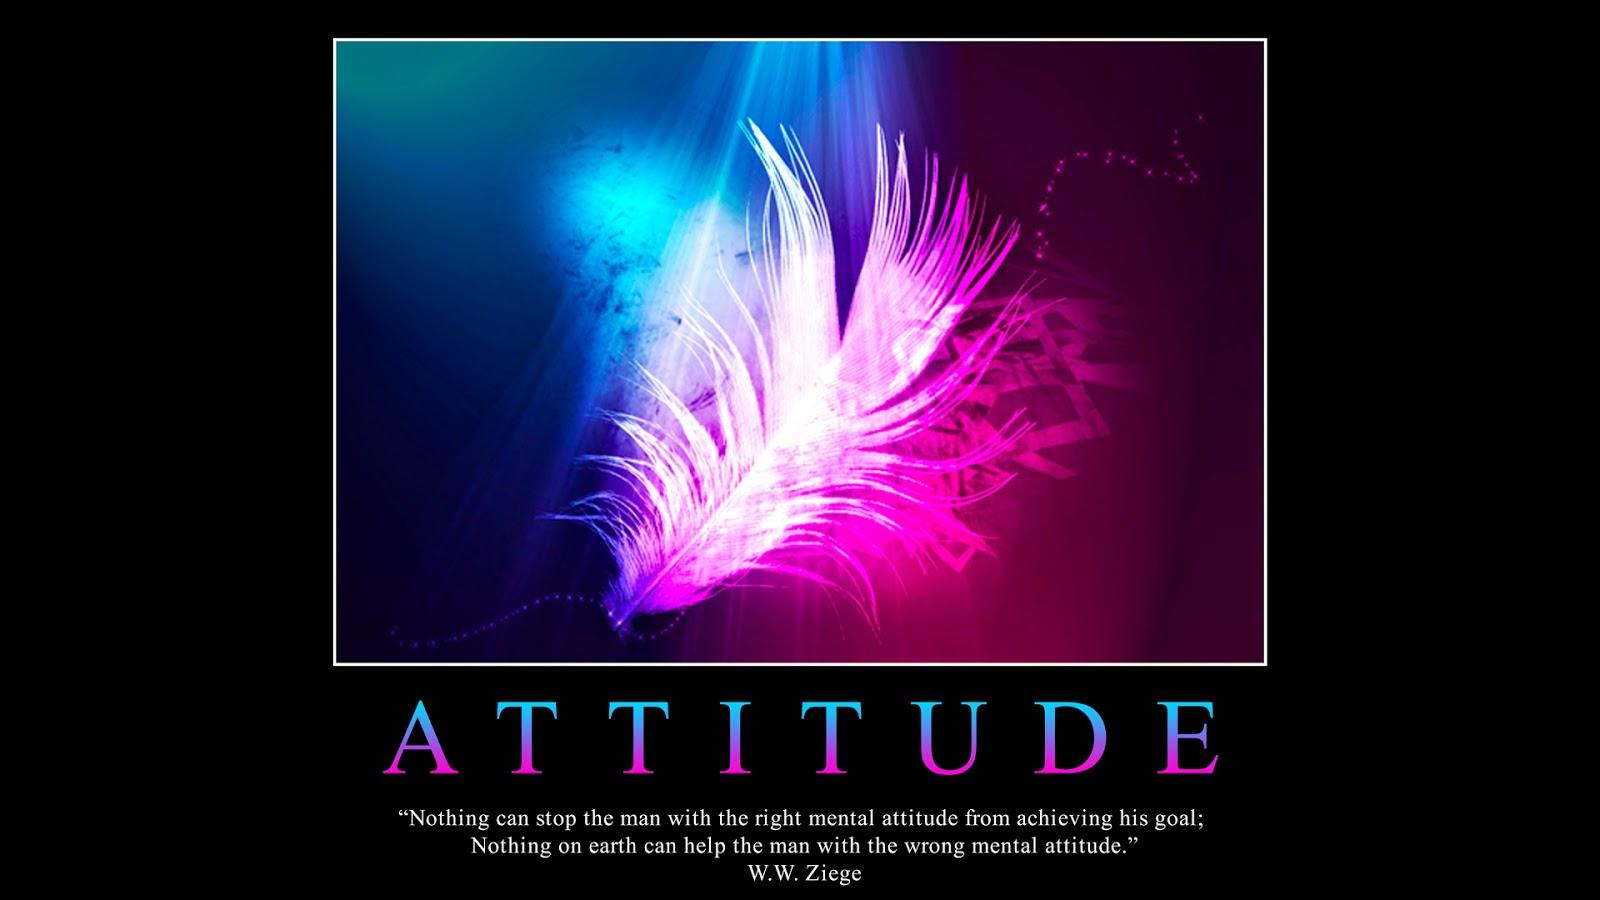 wallpaper quotes on attitude - photo #11